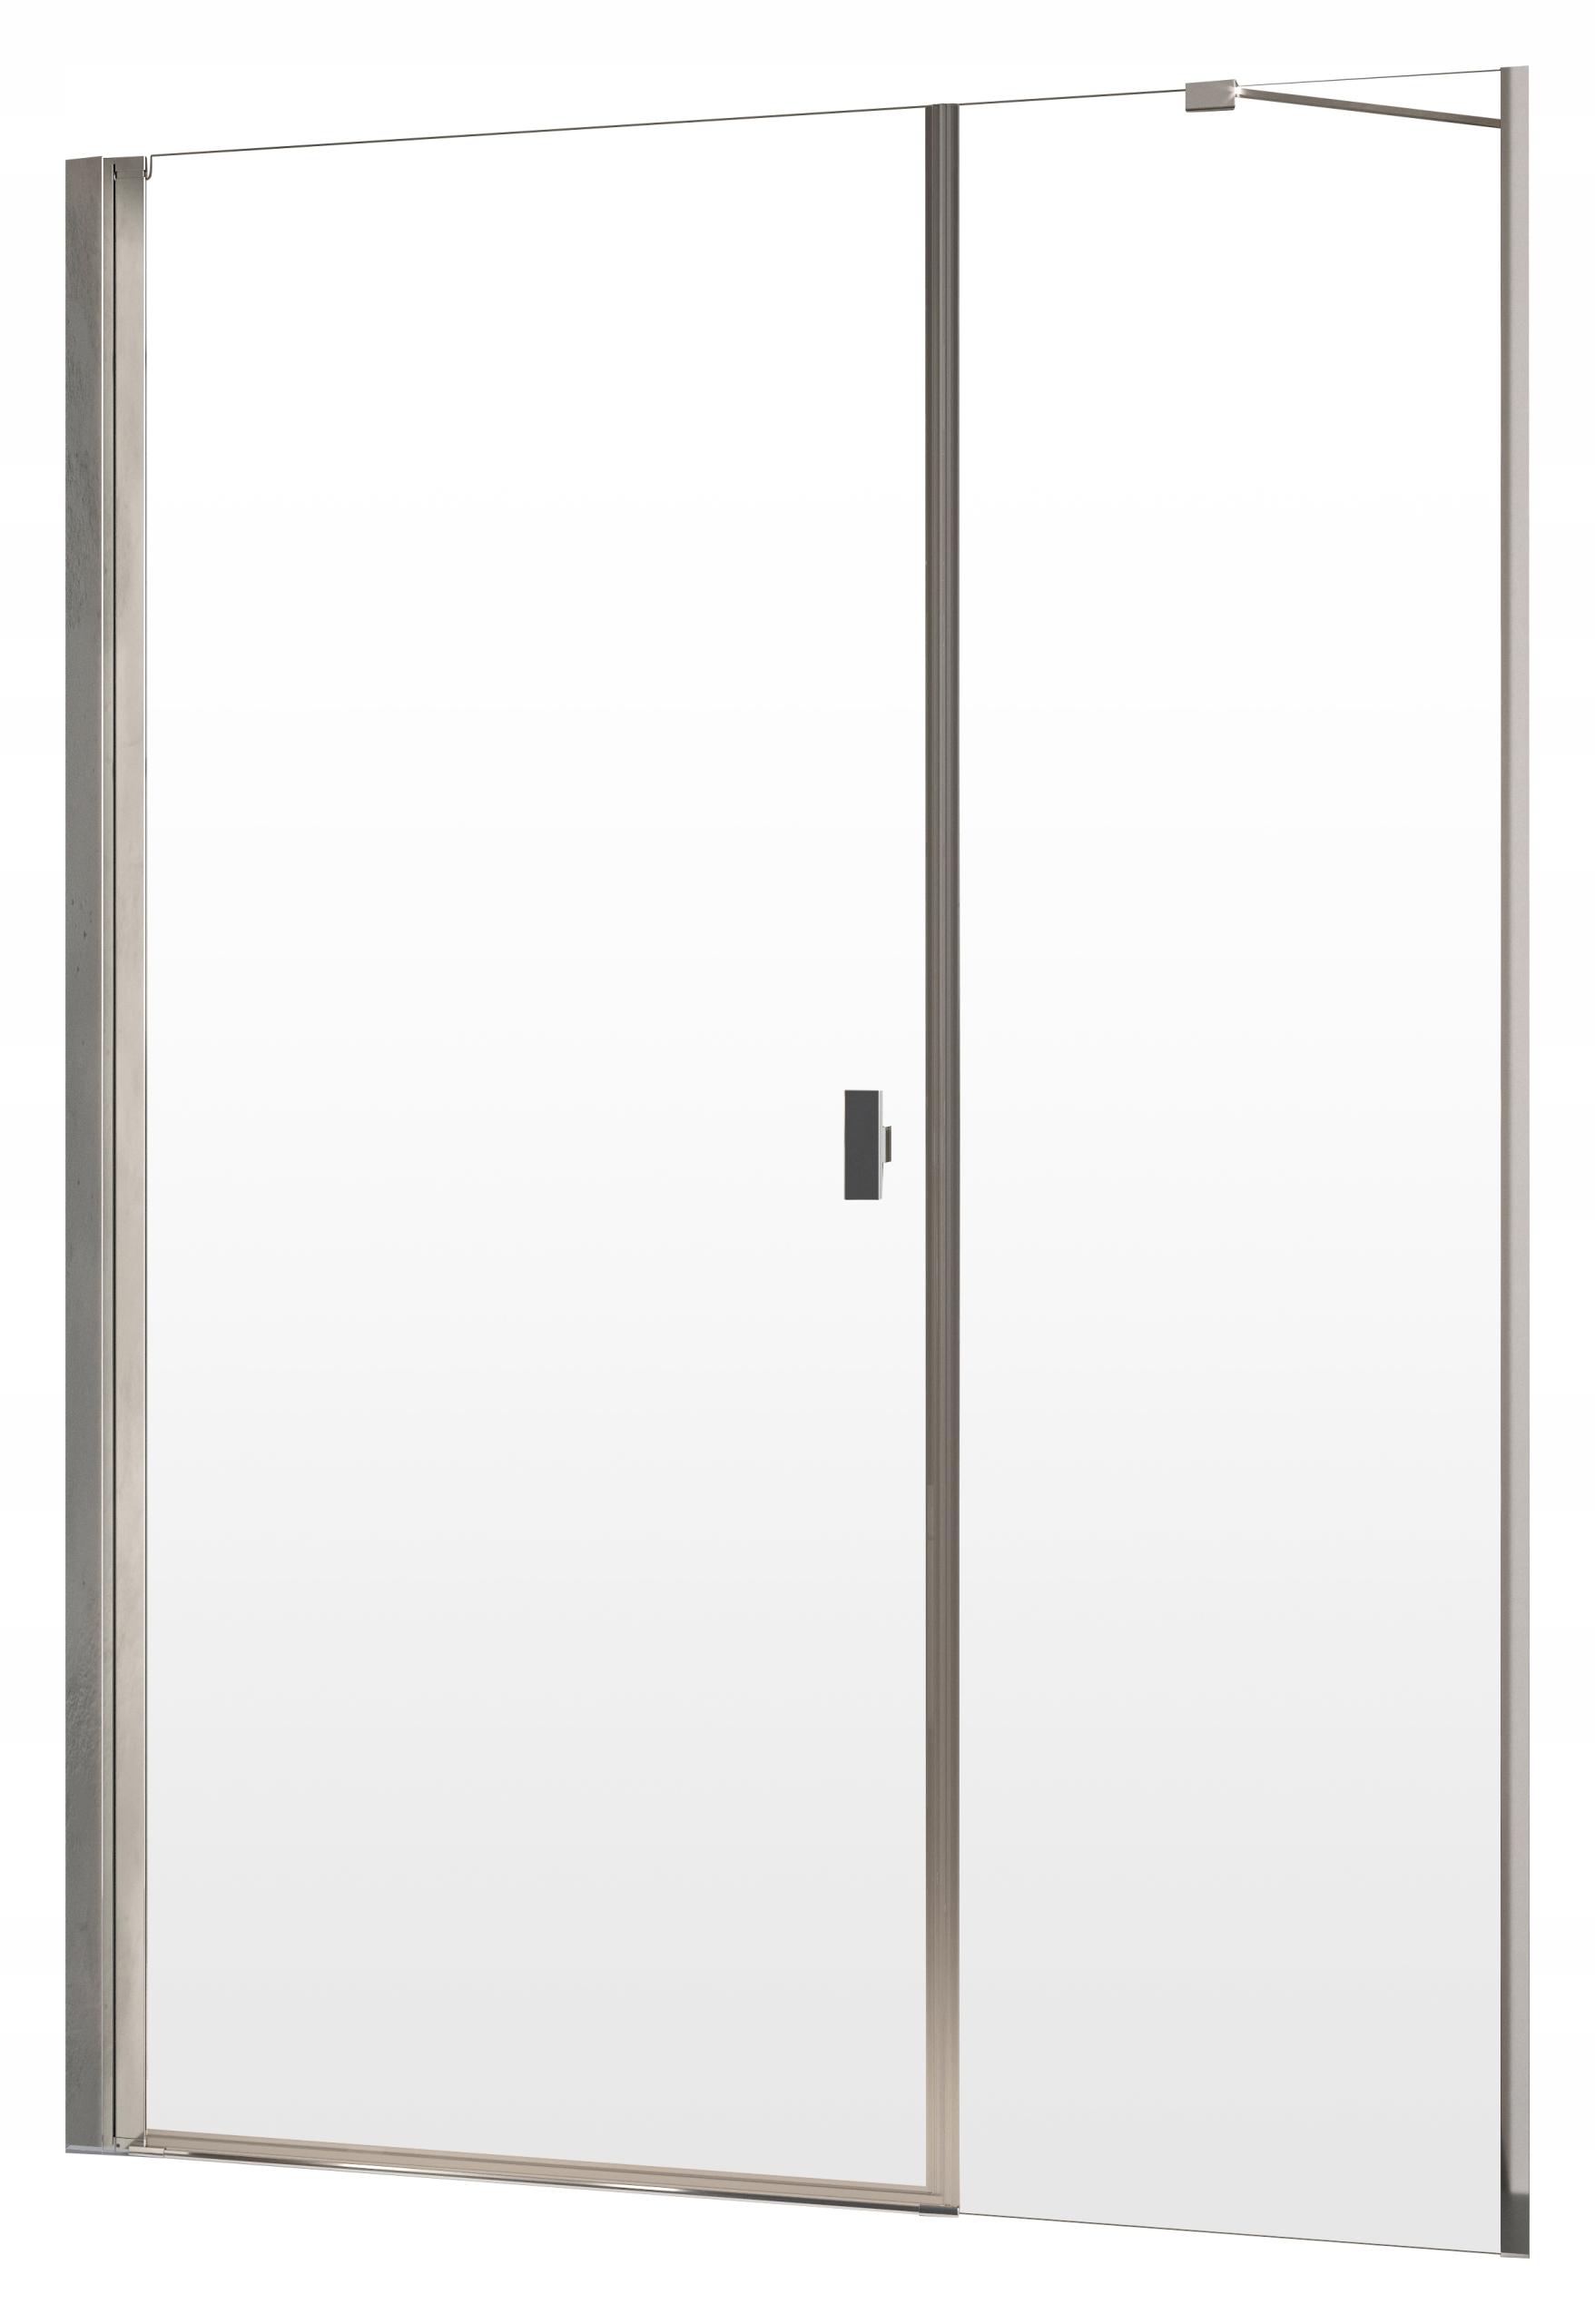 Sprchové dvere Nes DWS 110x200 RADAWAY